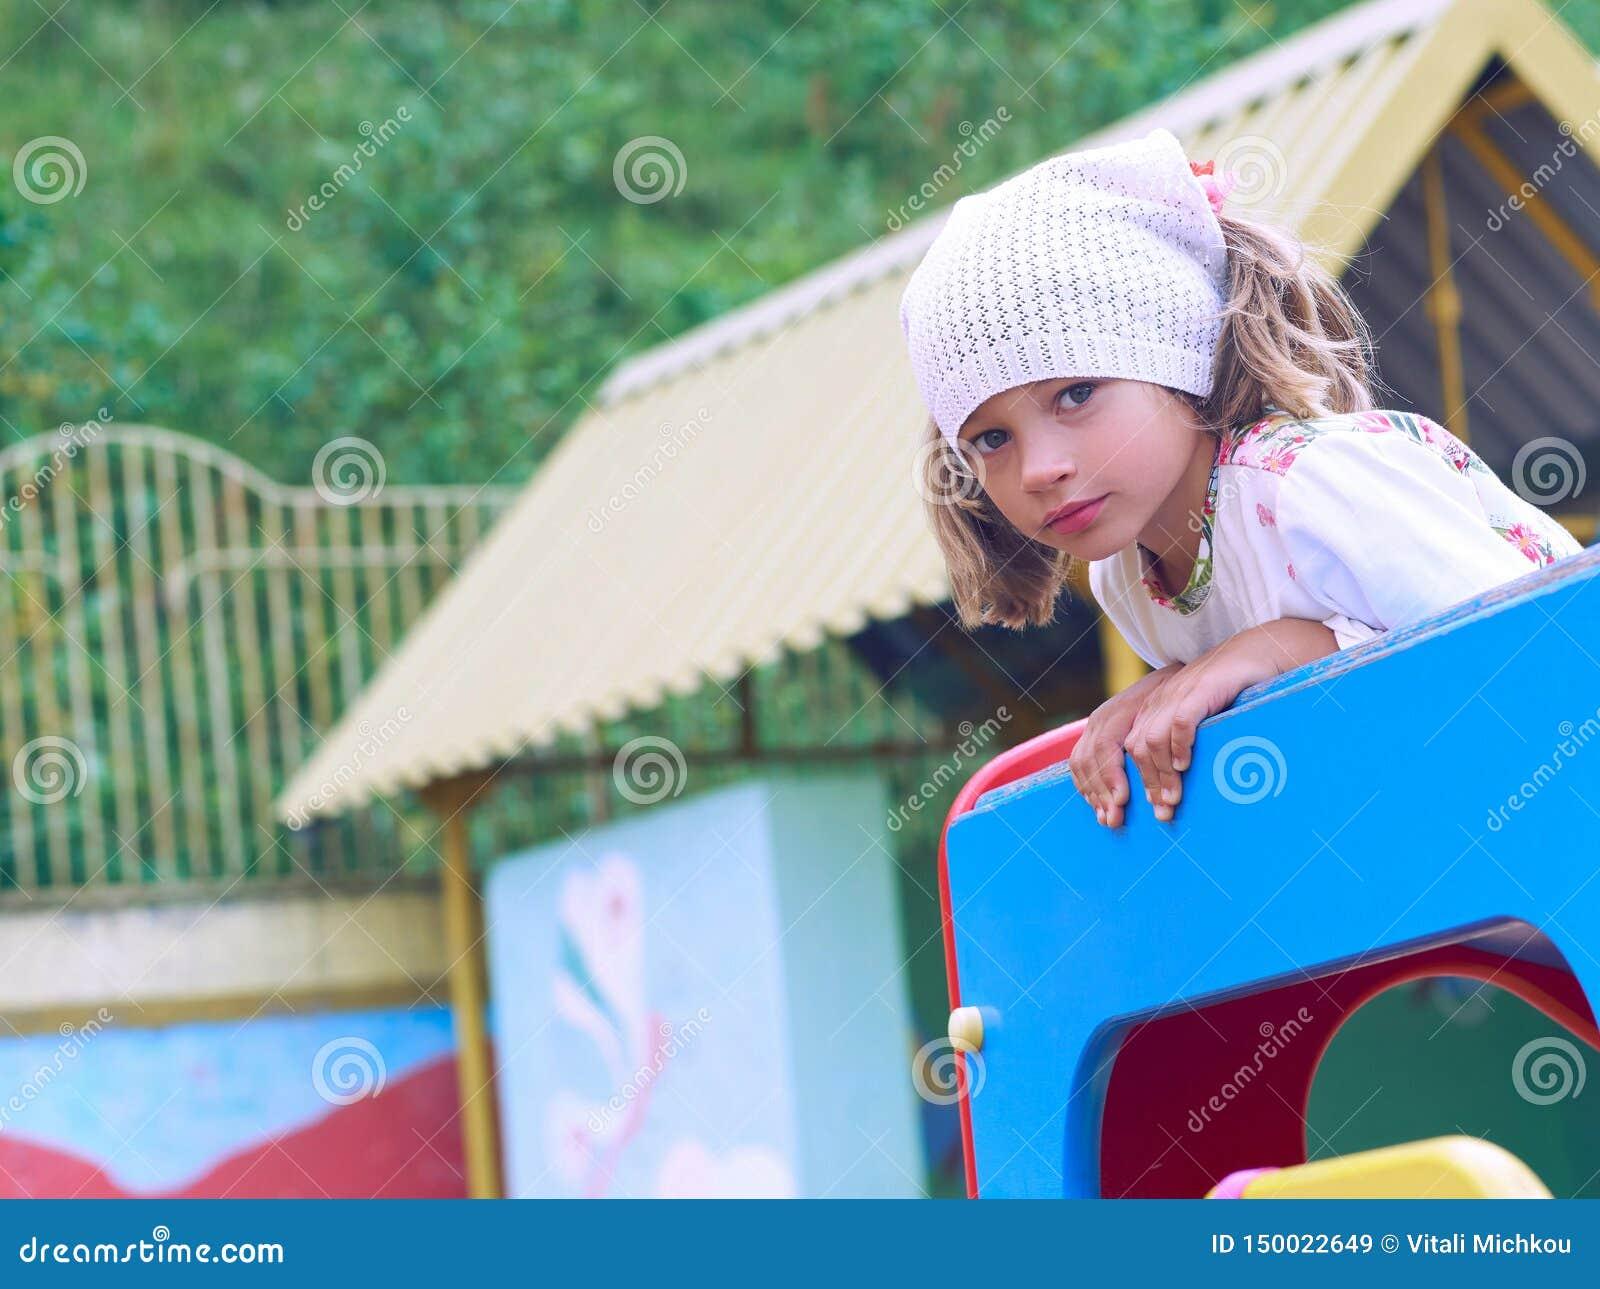 2 children playground 逗人喜爱的女孩获得乐趣在公园